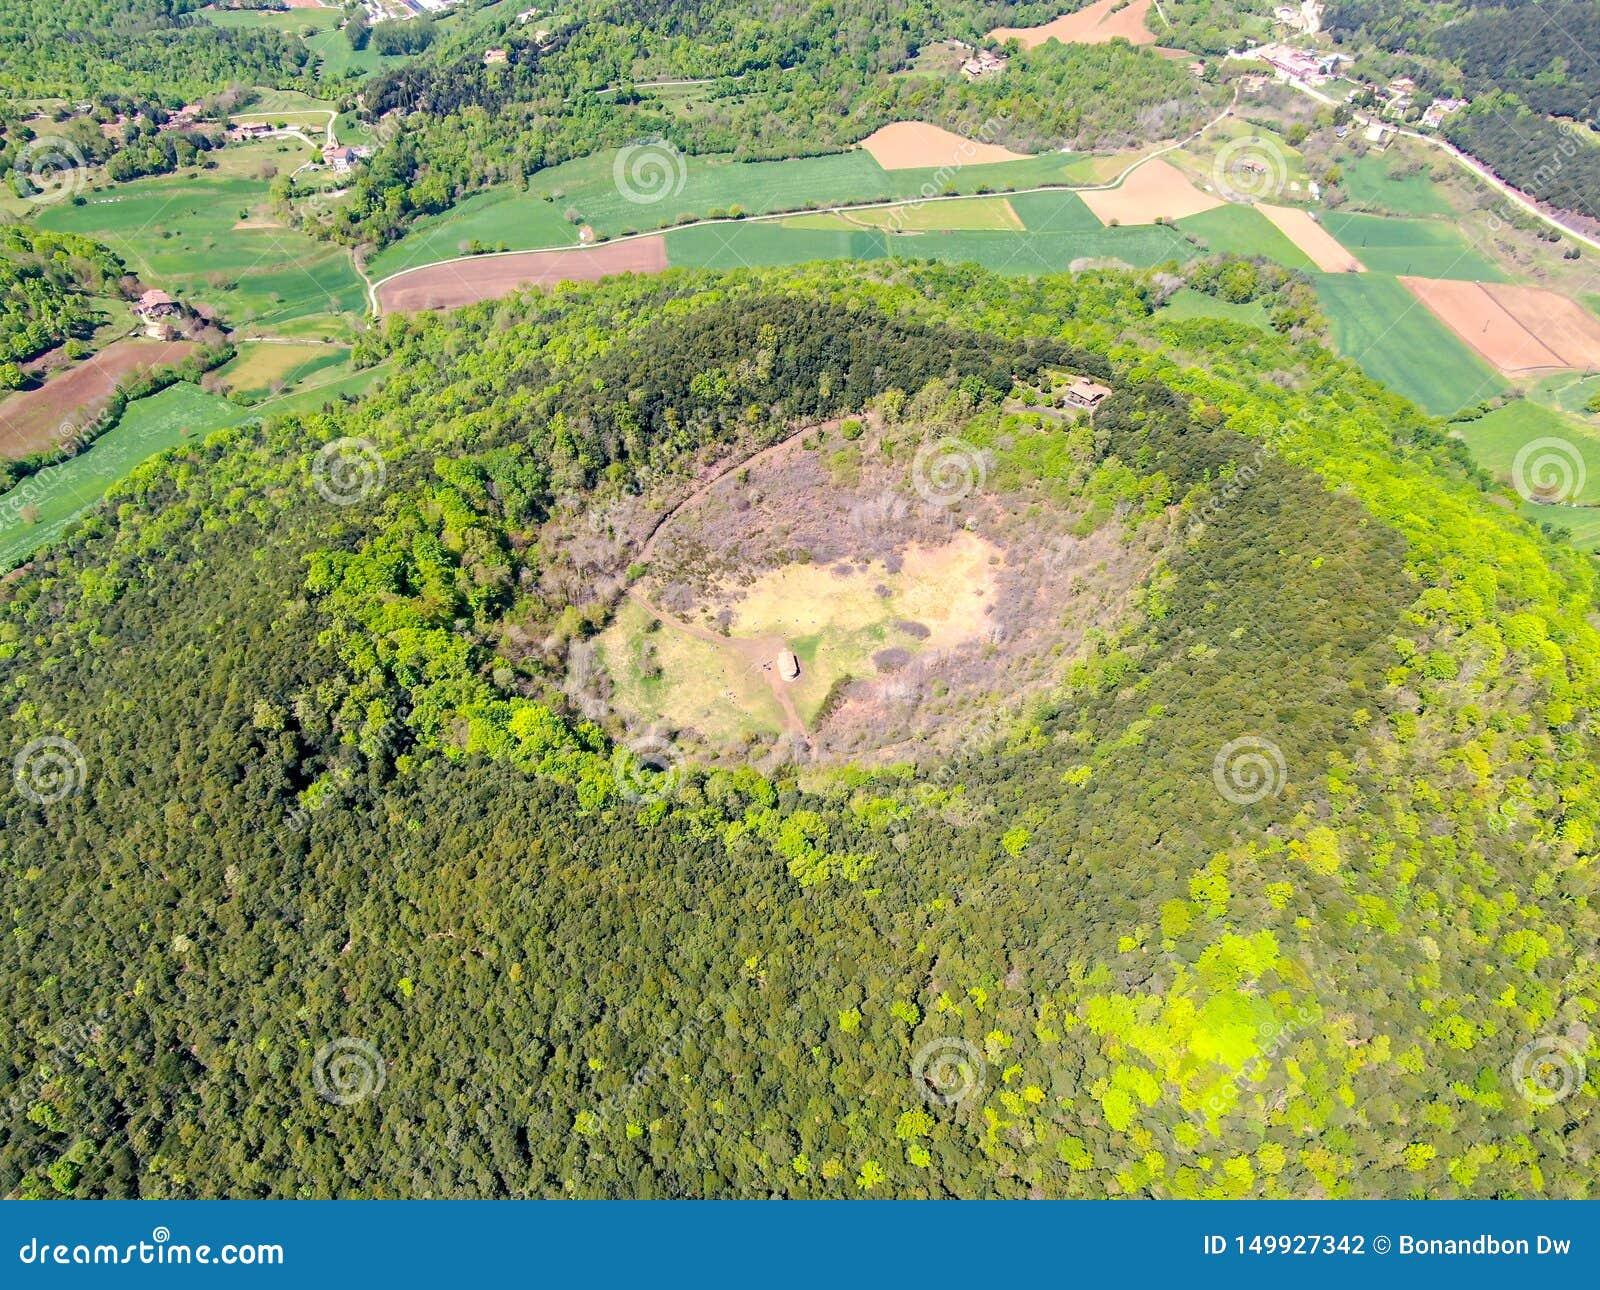 The Santa Margarida Volcano is an extinct volcano in the comarca of Garrotxa, Catalonia, Spain